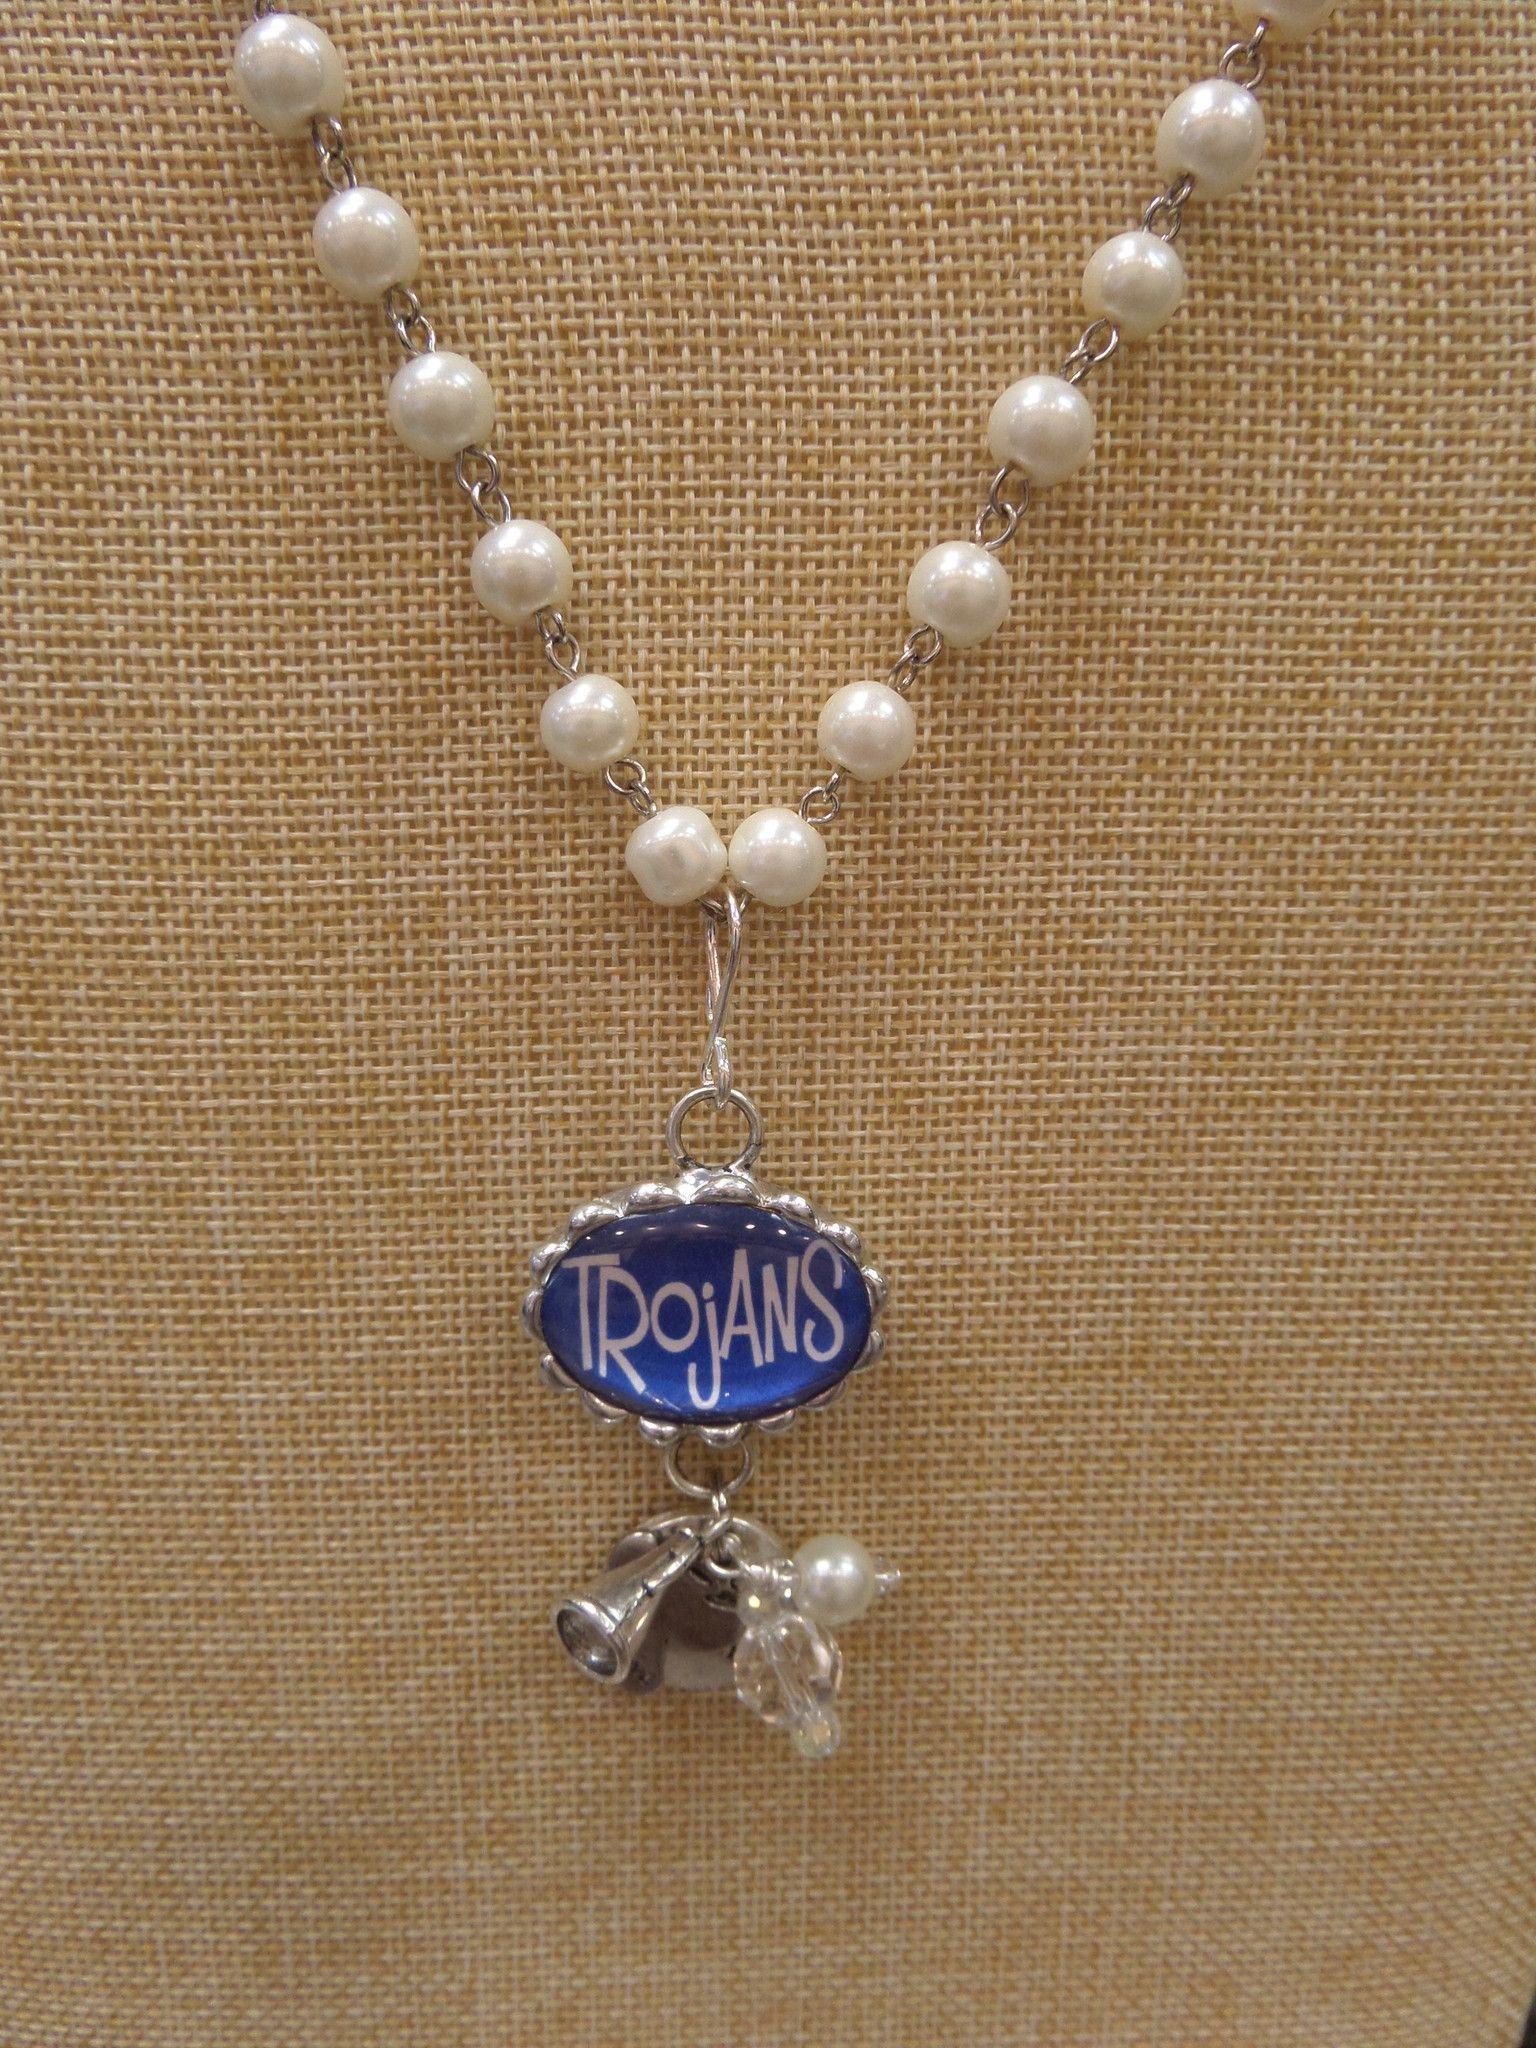 ADO | Hometown Pride Trojans Charm Rosary Necklace